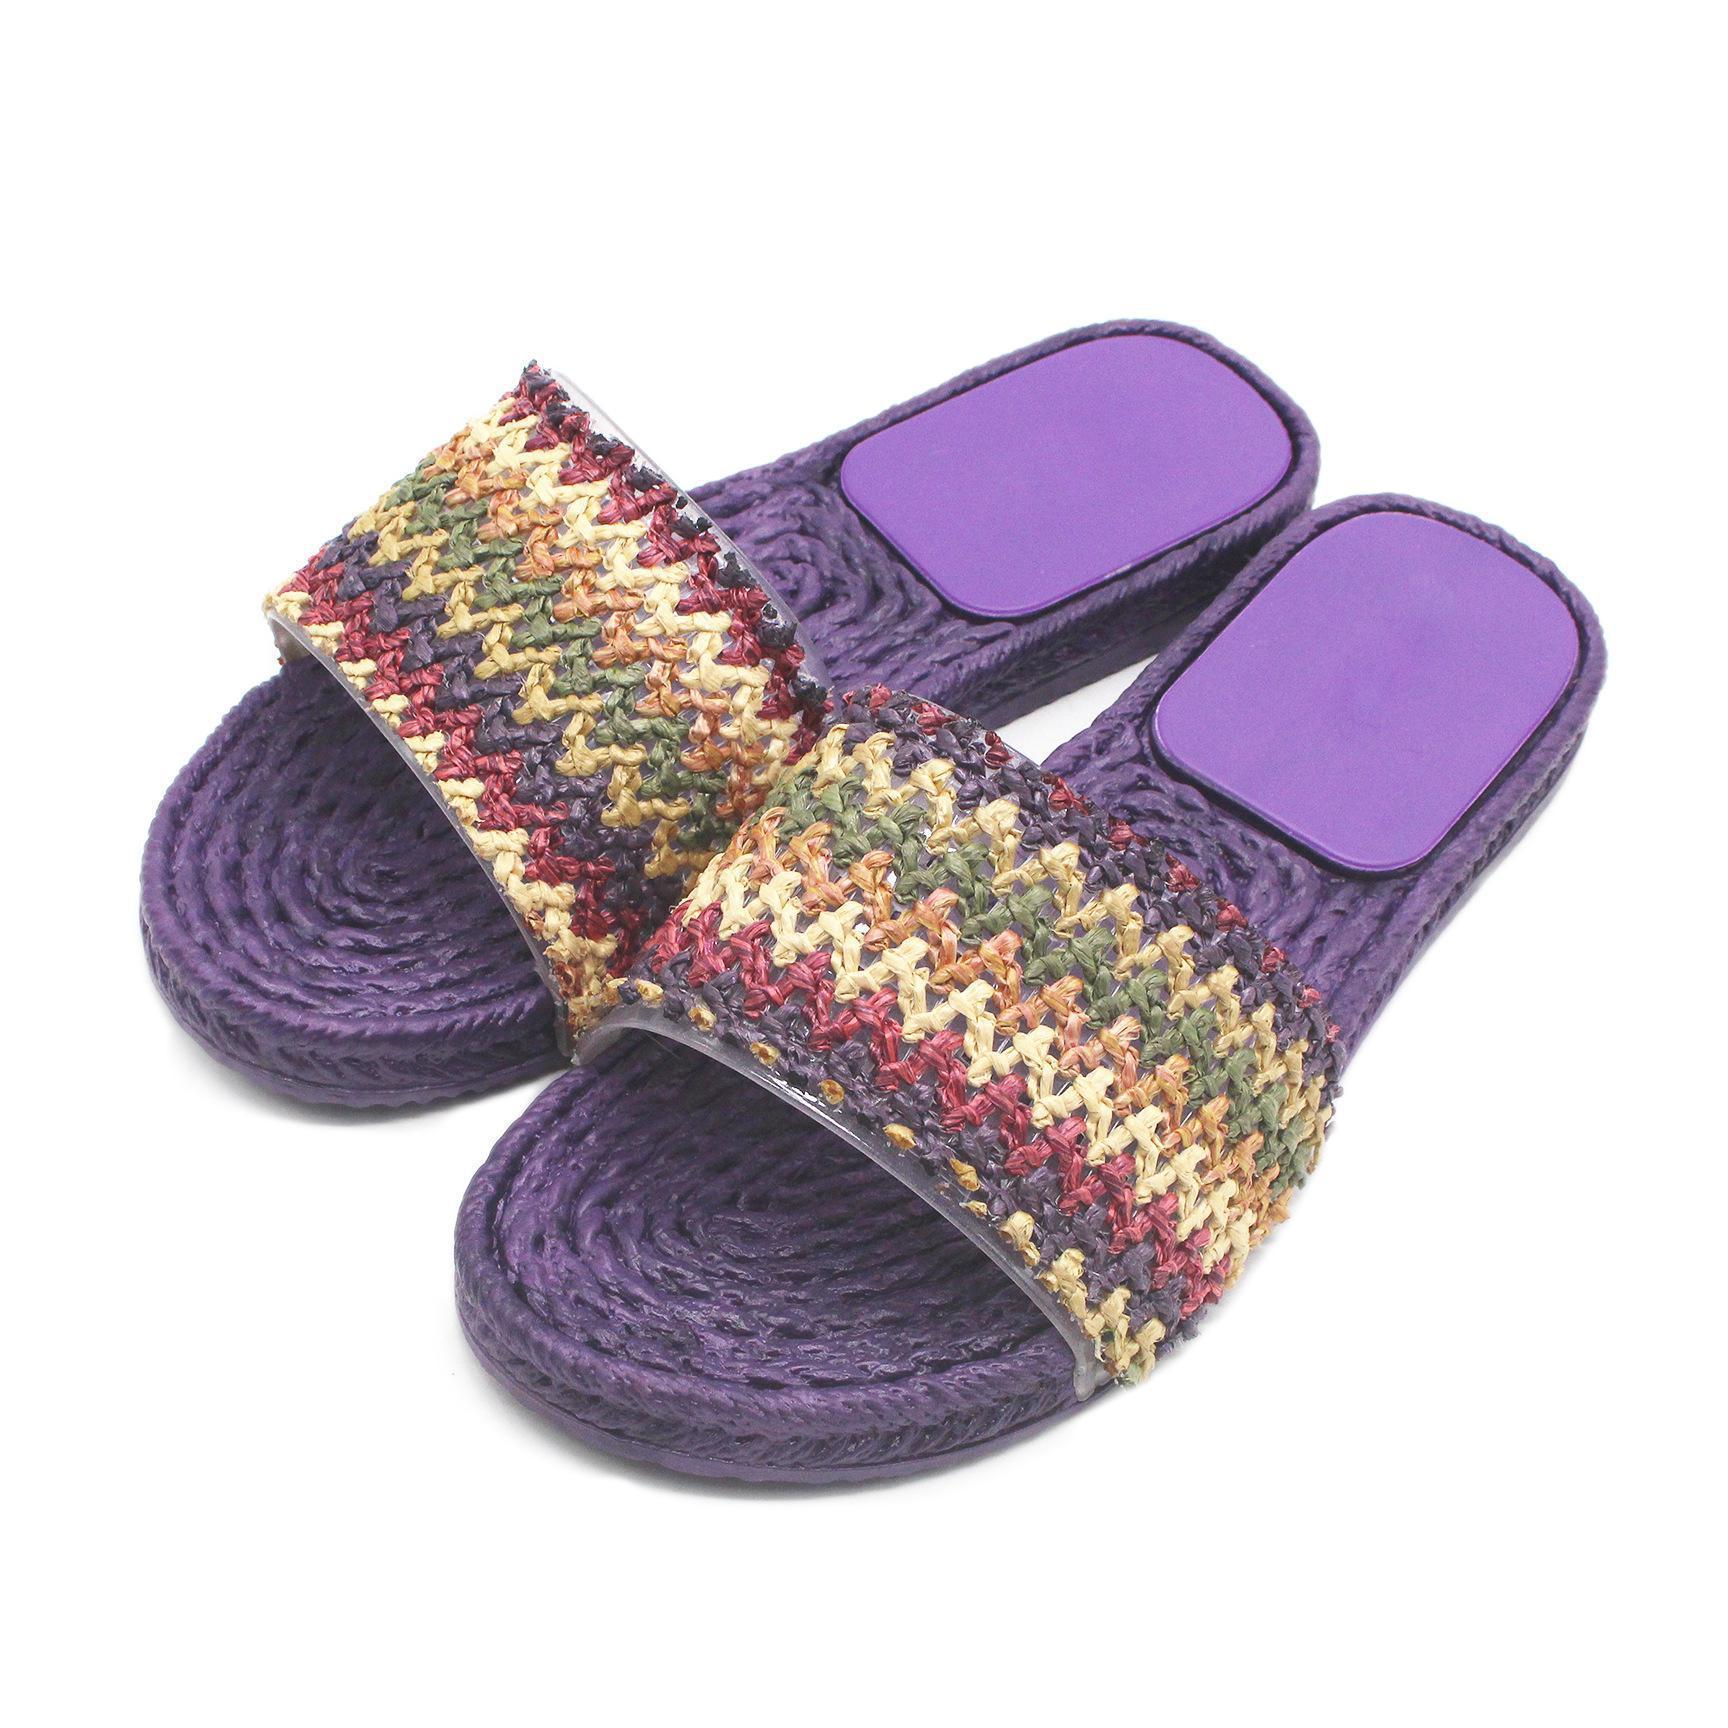 Verão Chinelos Weaving Sandals Mulheres Sapatos Indoor Chinelos Flip Flops banheiro piso Chinelo Shoes Moda Mulher Slides